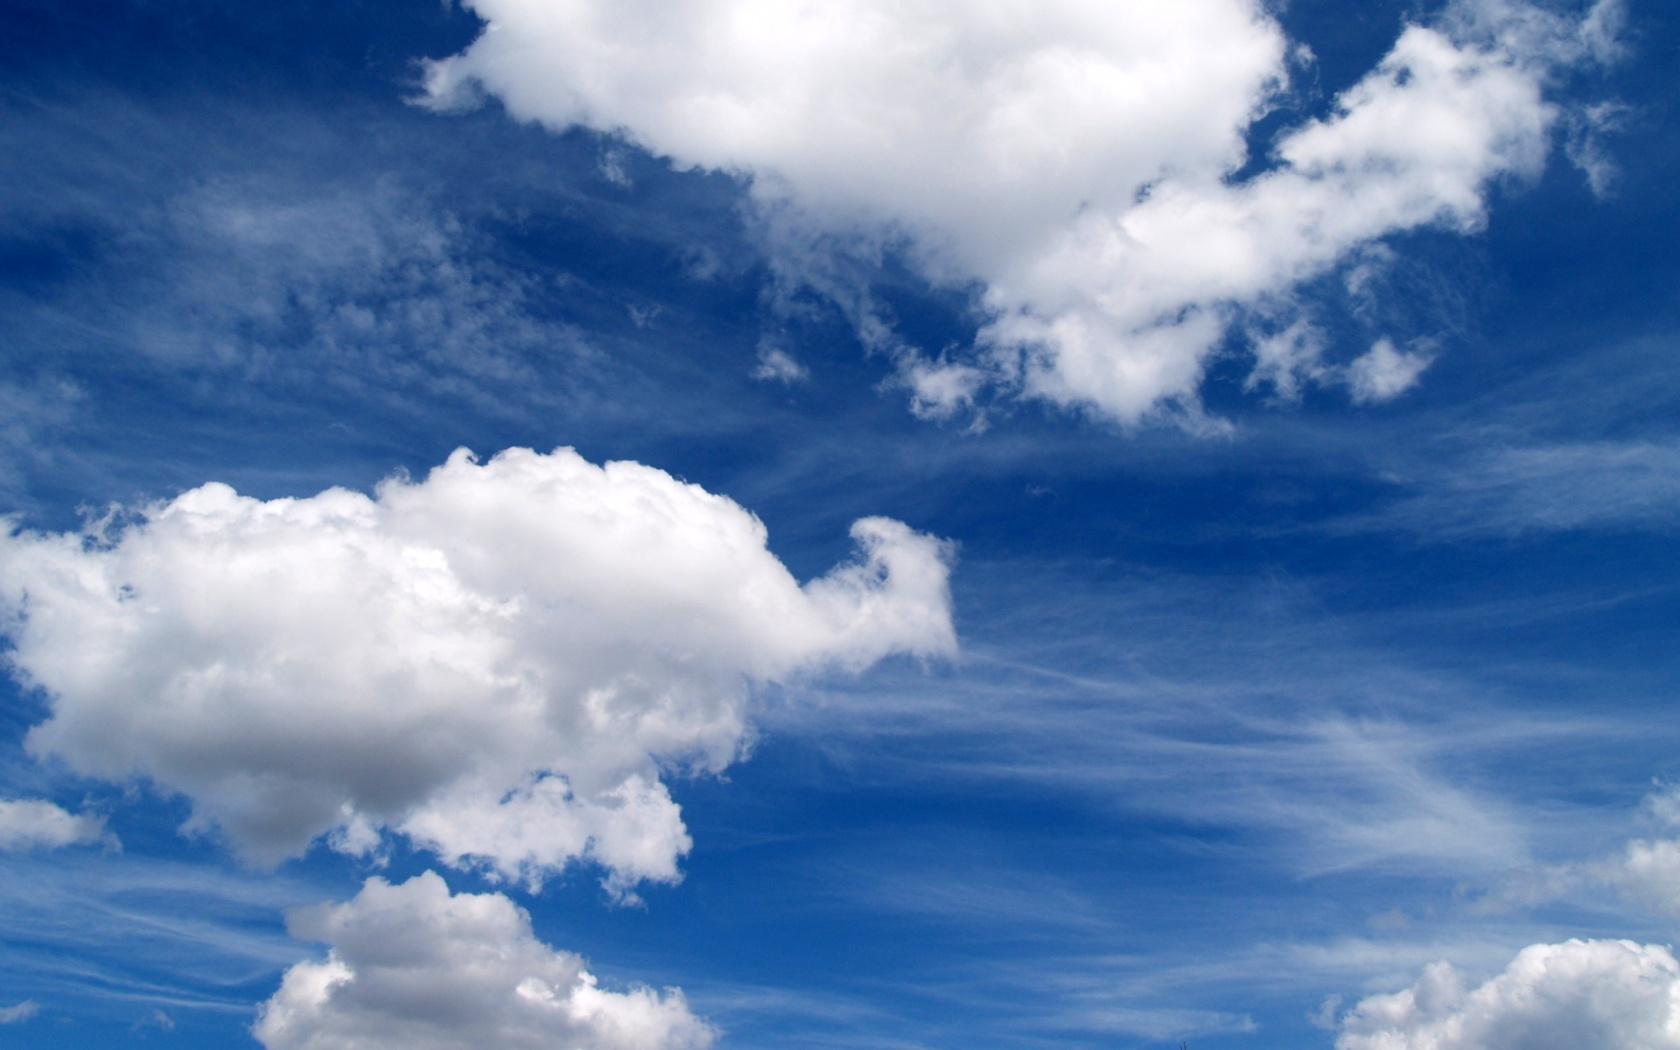 Dreamful Sky Wallpapers HD Wallpapers 1680x1050